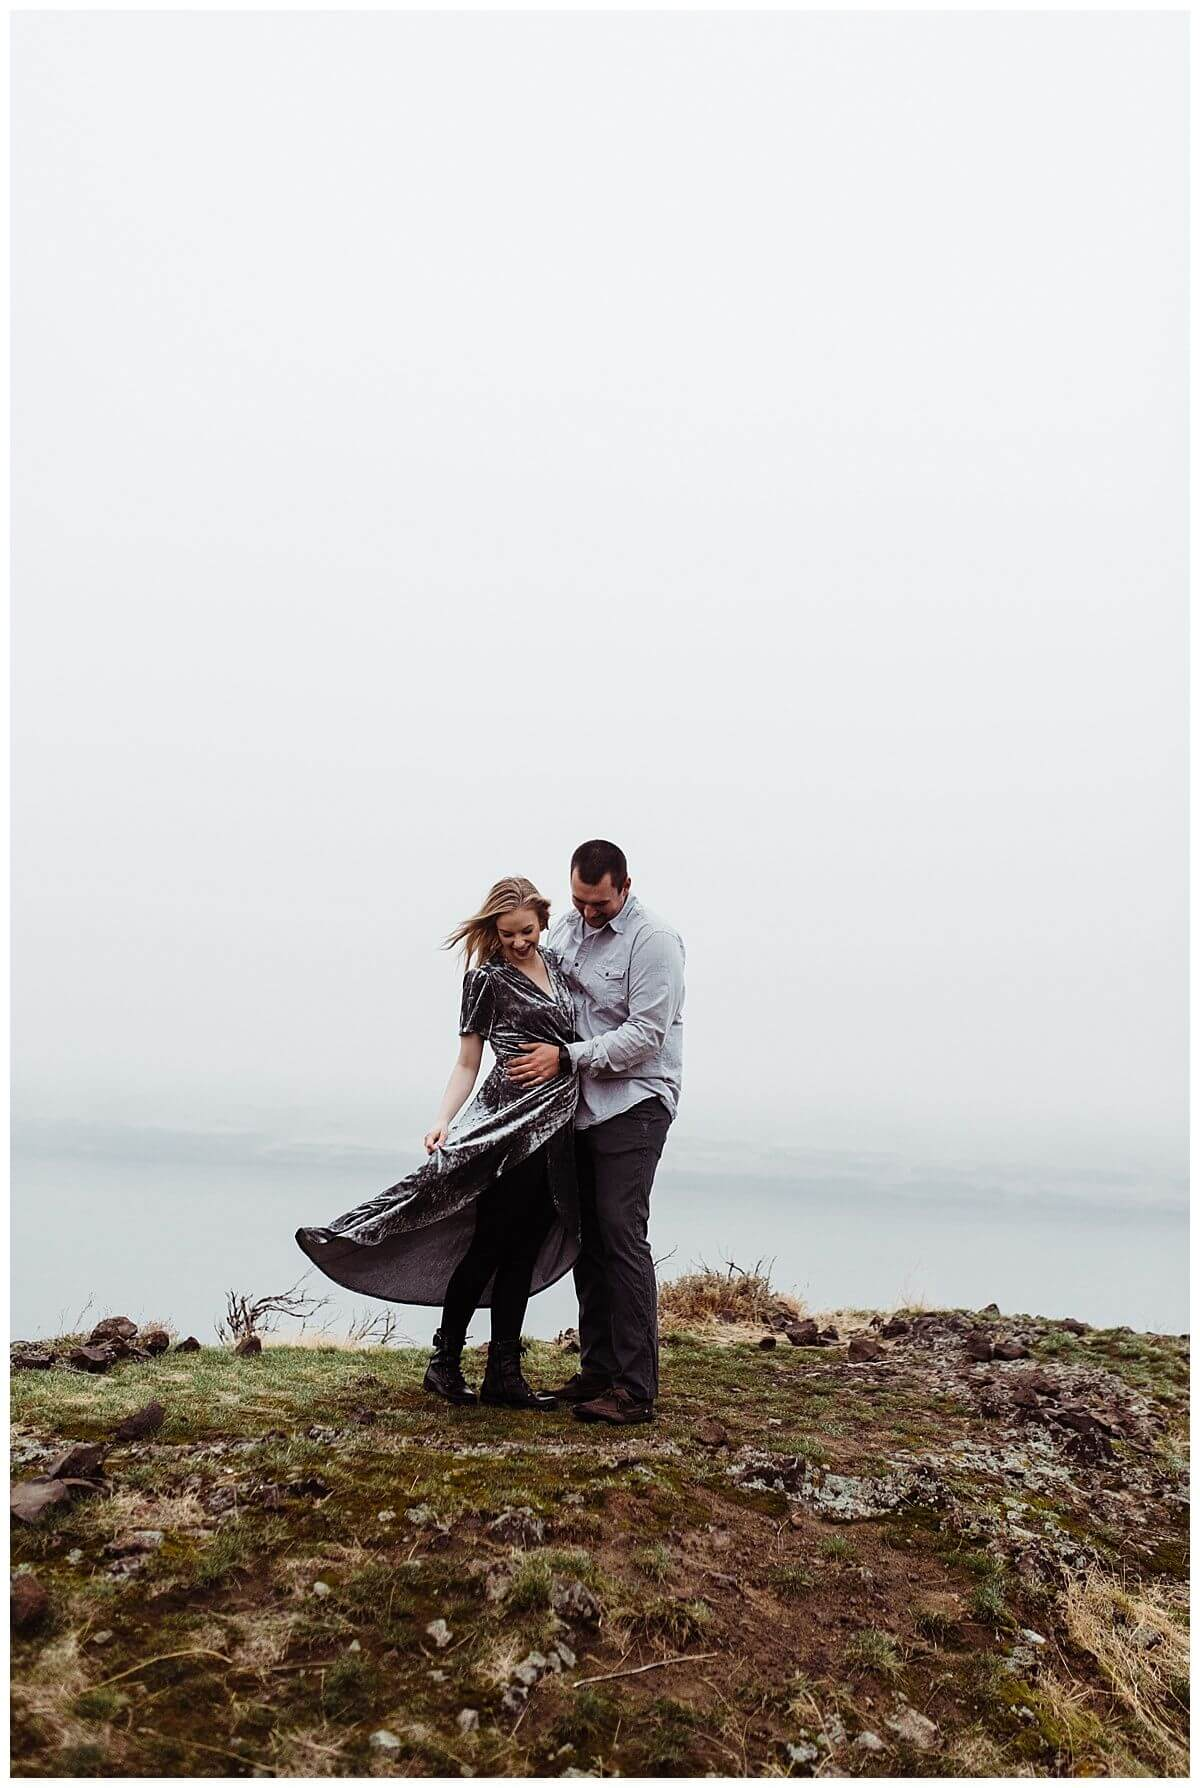 Oregon and Washington Couples Session | S Photography | Pacific Northwest Adventure Photographer